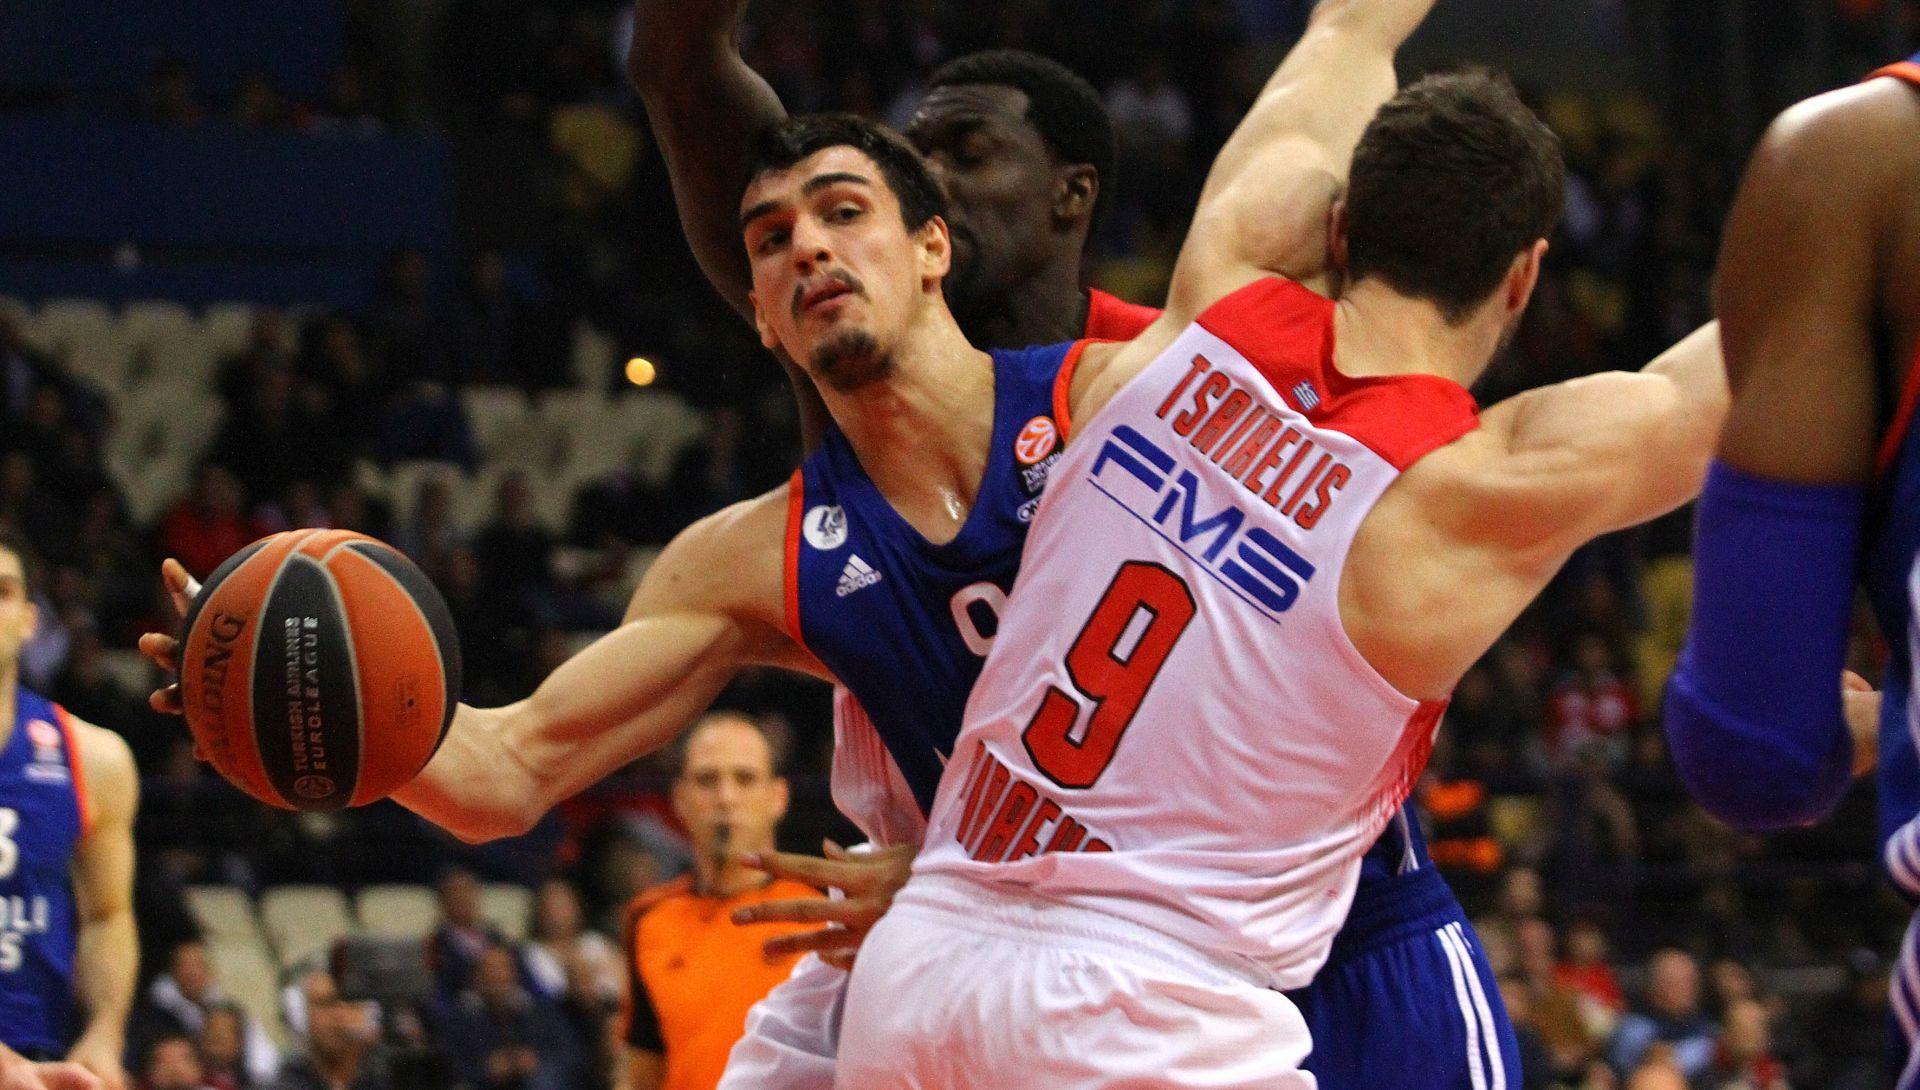 VIDEO: Euroliga: Šarić donio pobjedu Anadolu Efesu protiv Crvene zvezde